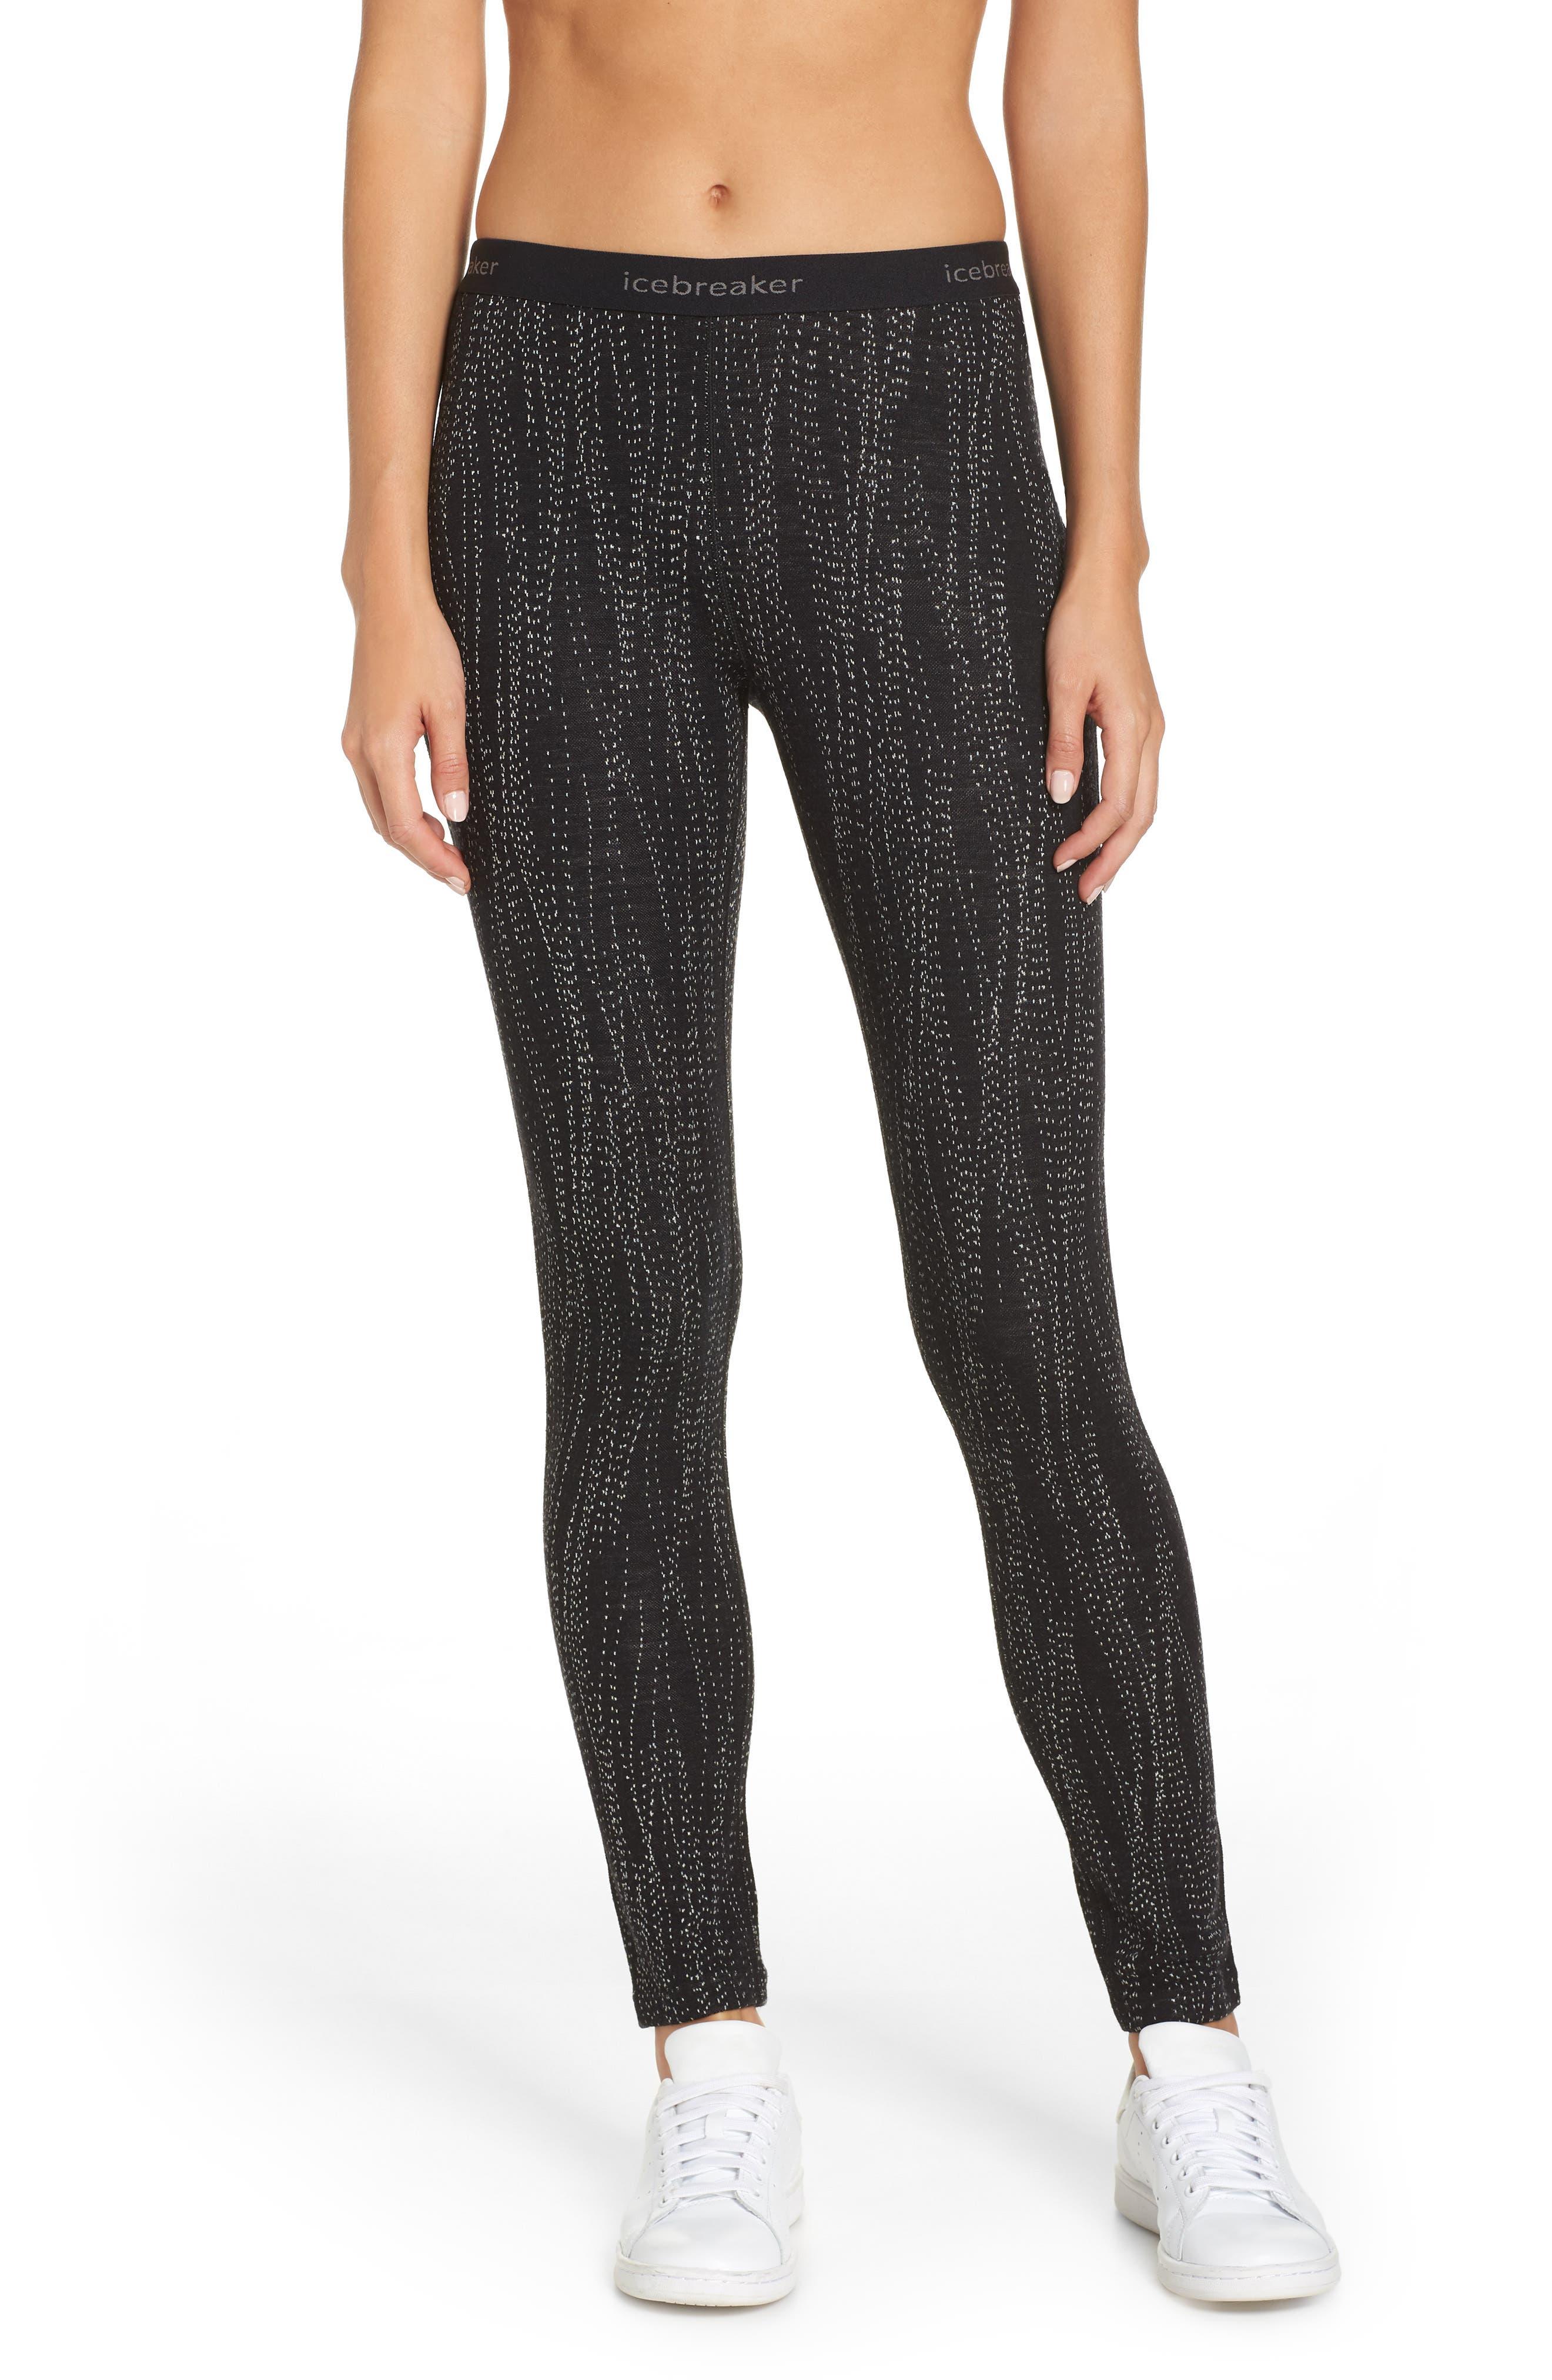 250 Vertex Merino Wool Base Layer Leggings,                         Main,                         color, BLACK/ SNOW